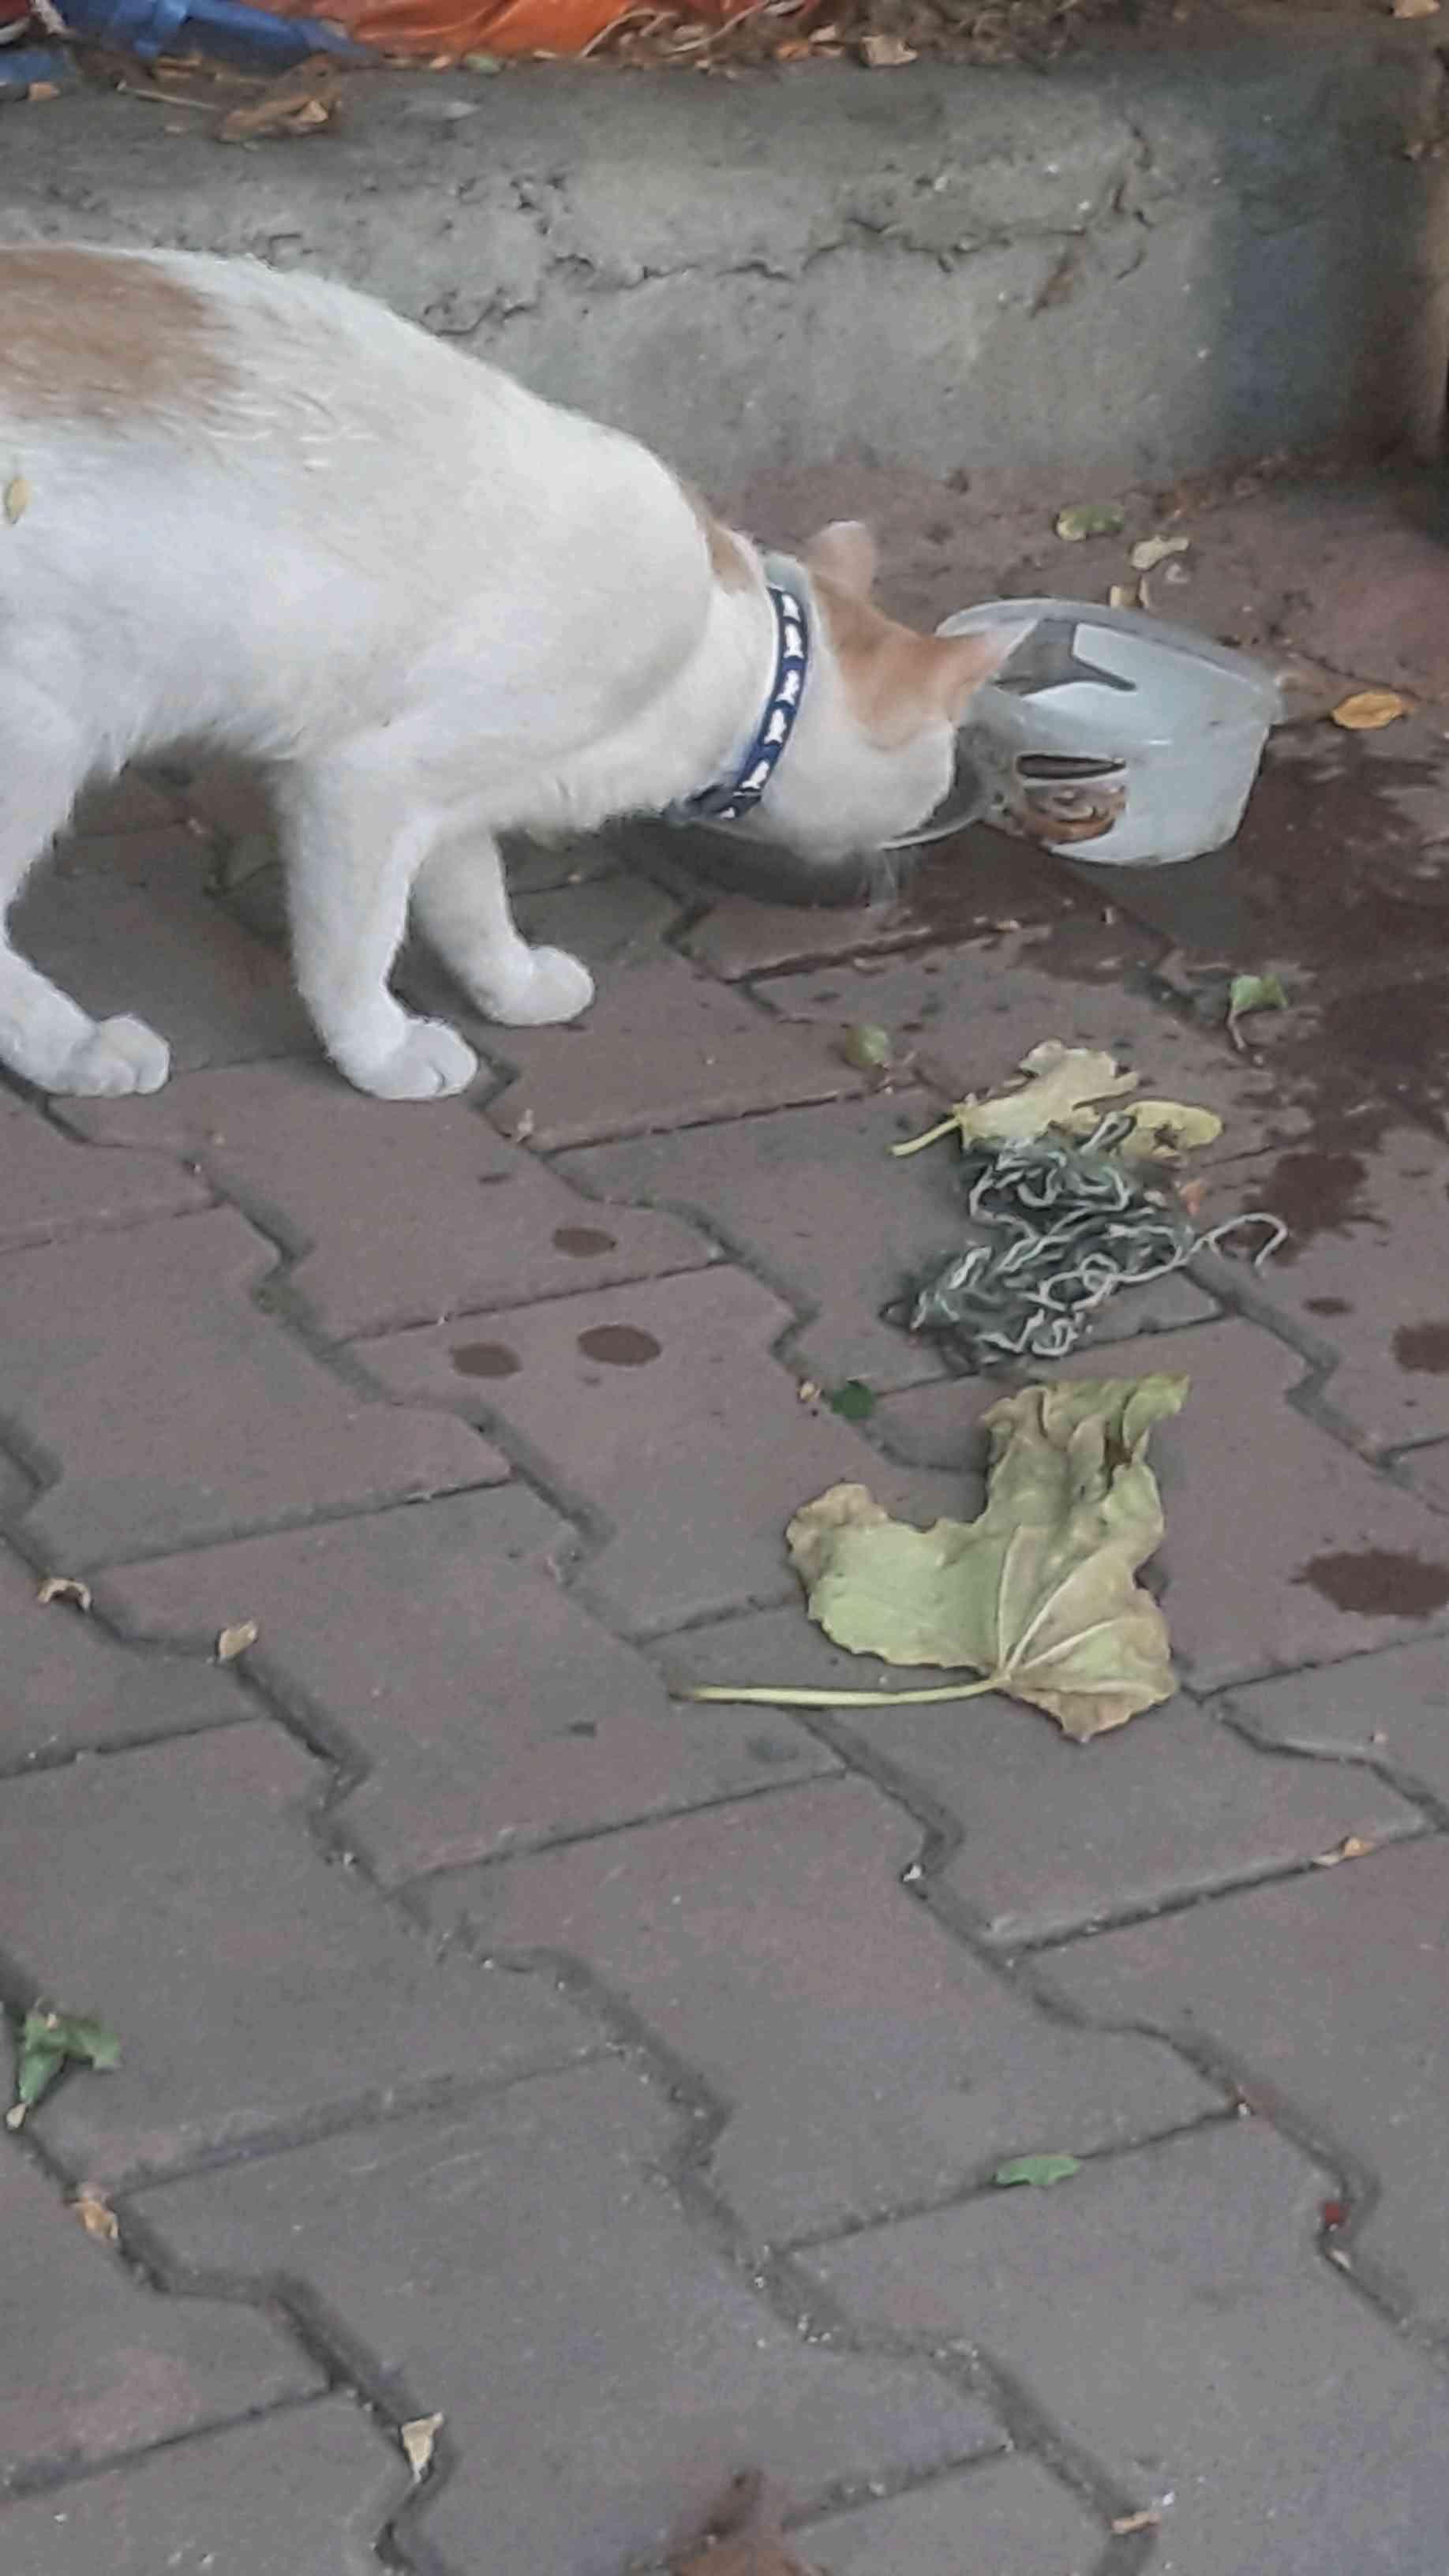 Kahramanmaraş Namık Kemalde kayıp olan van kedimiz.